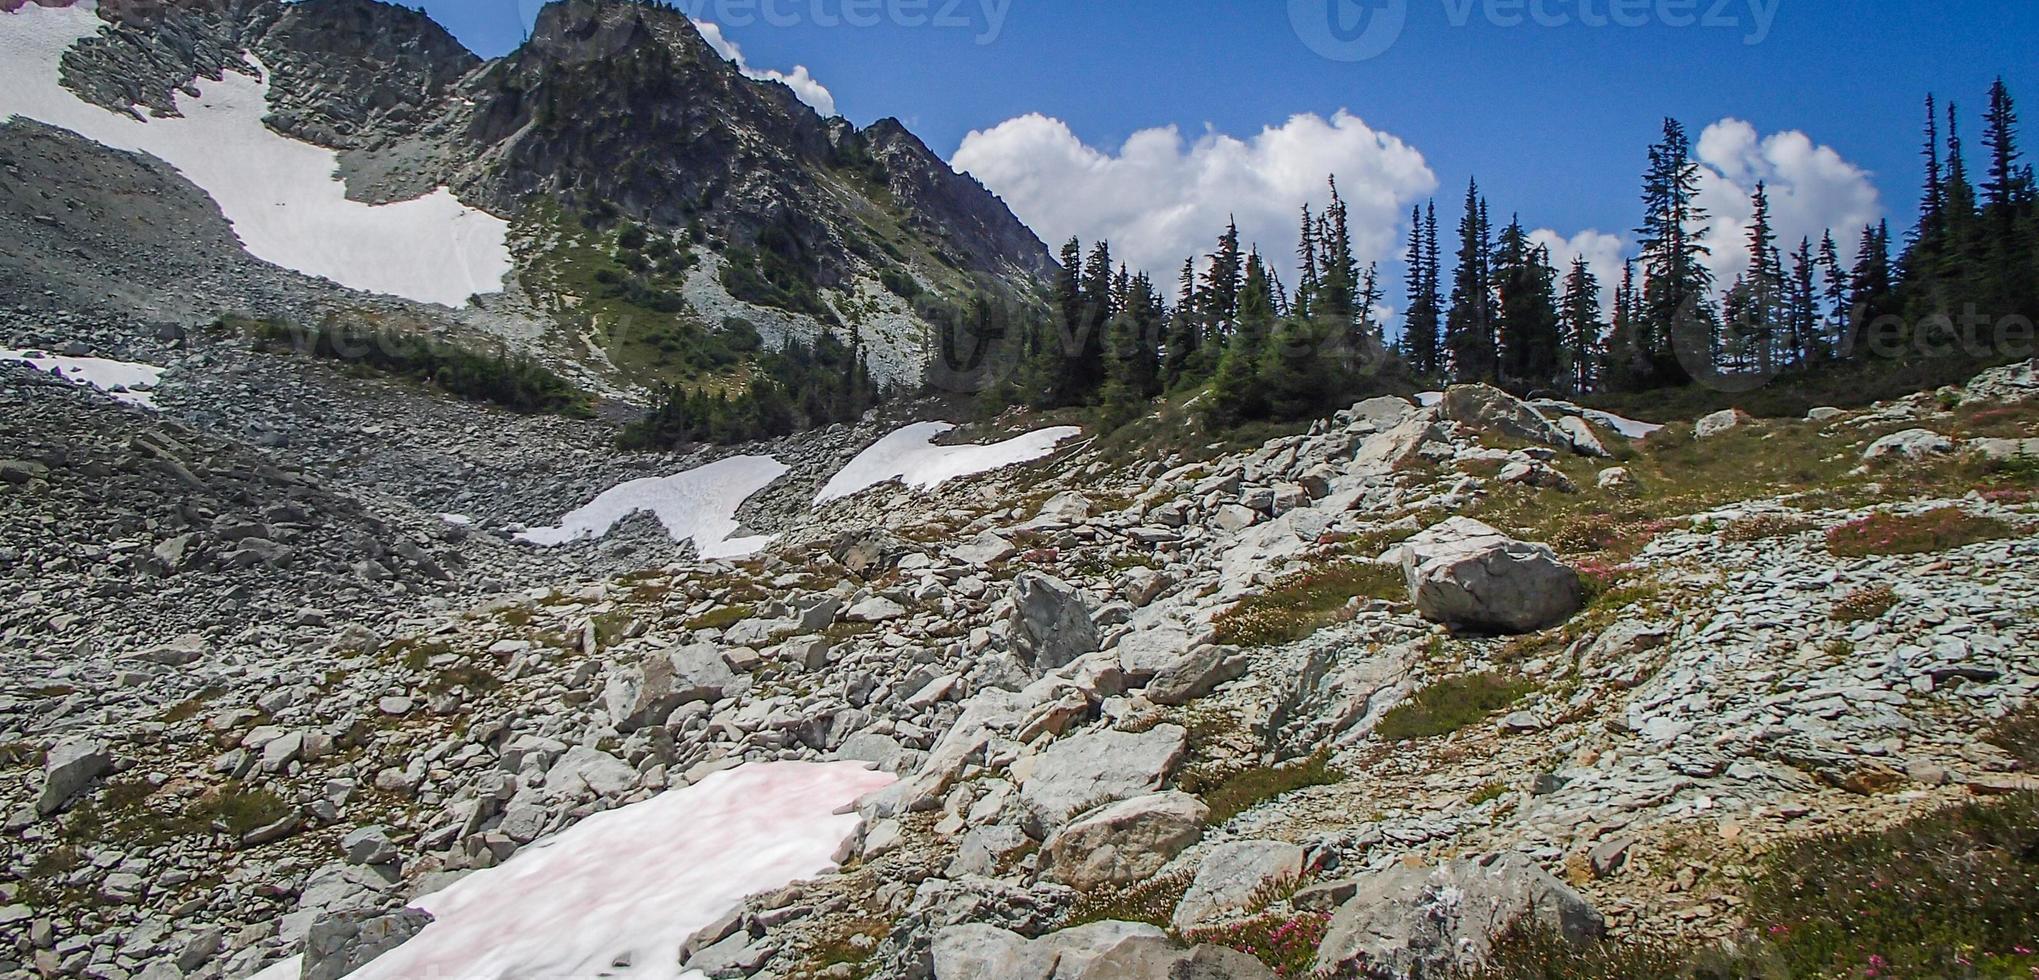 Glaciers amongst boulders, pine and snow photo